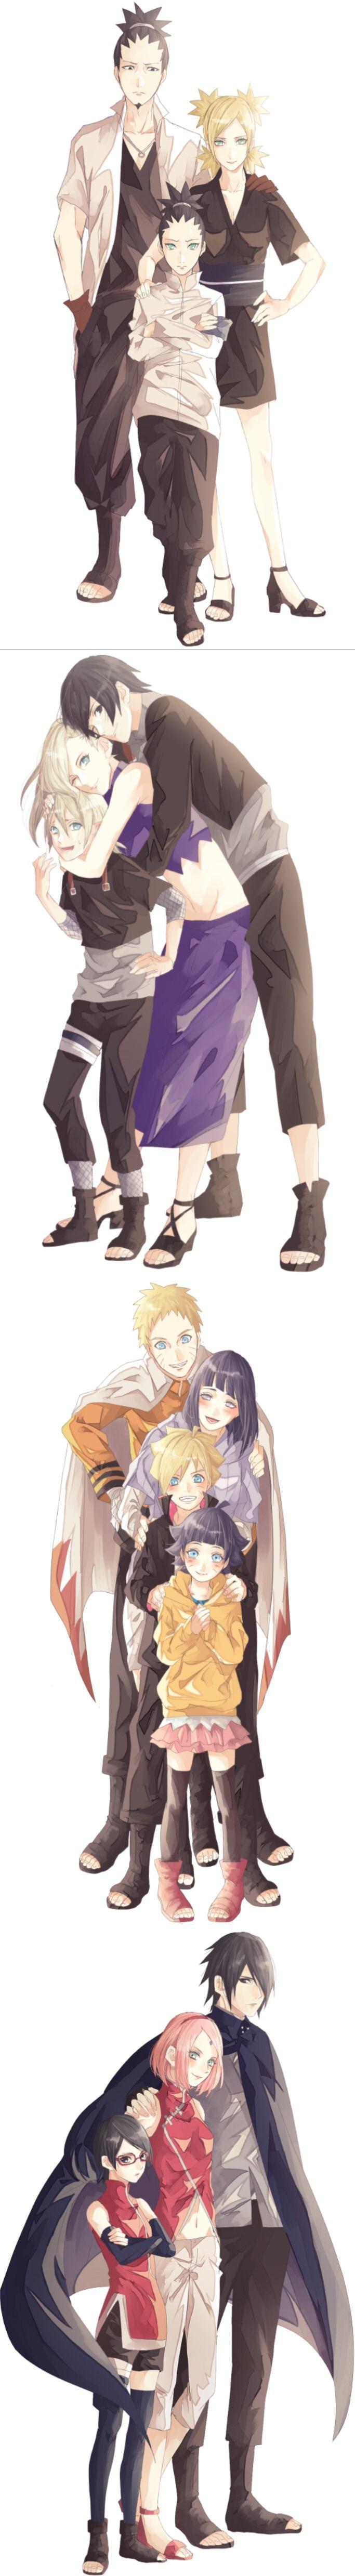 468 best Anime Manga images on Pinterest